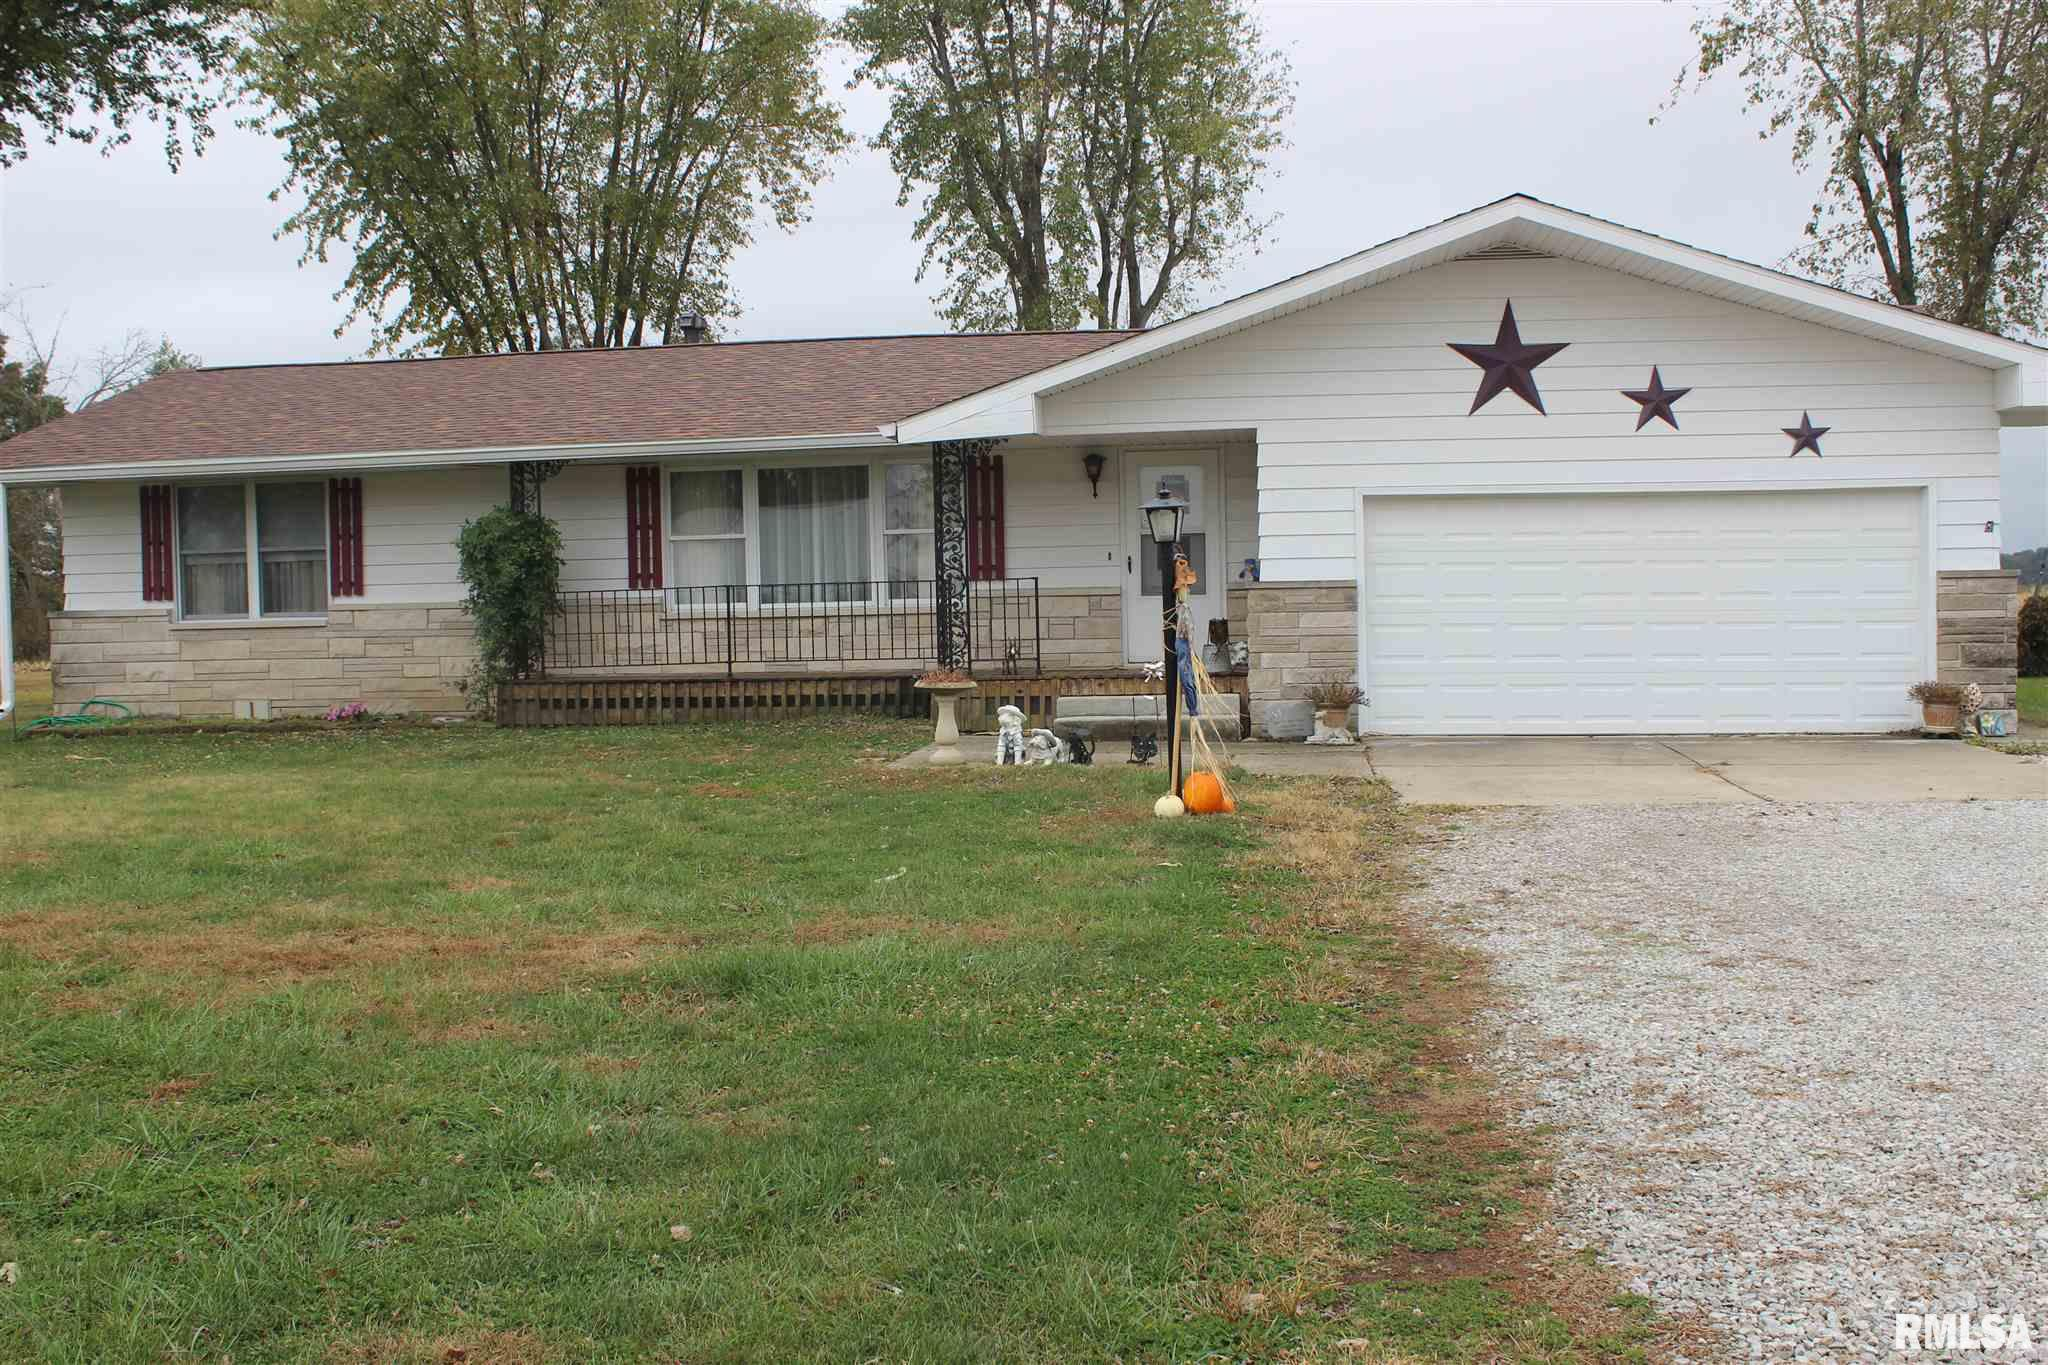 612 W POPLAR Property Photo - Odin, IL real estate listing